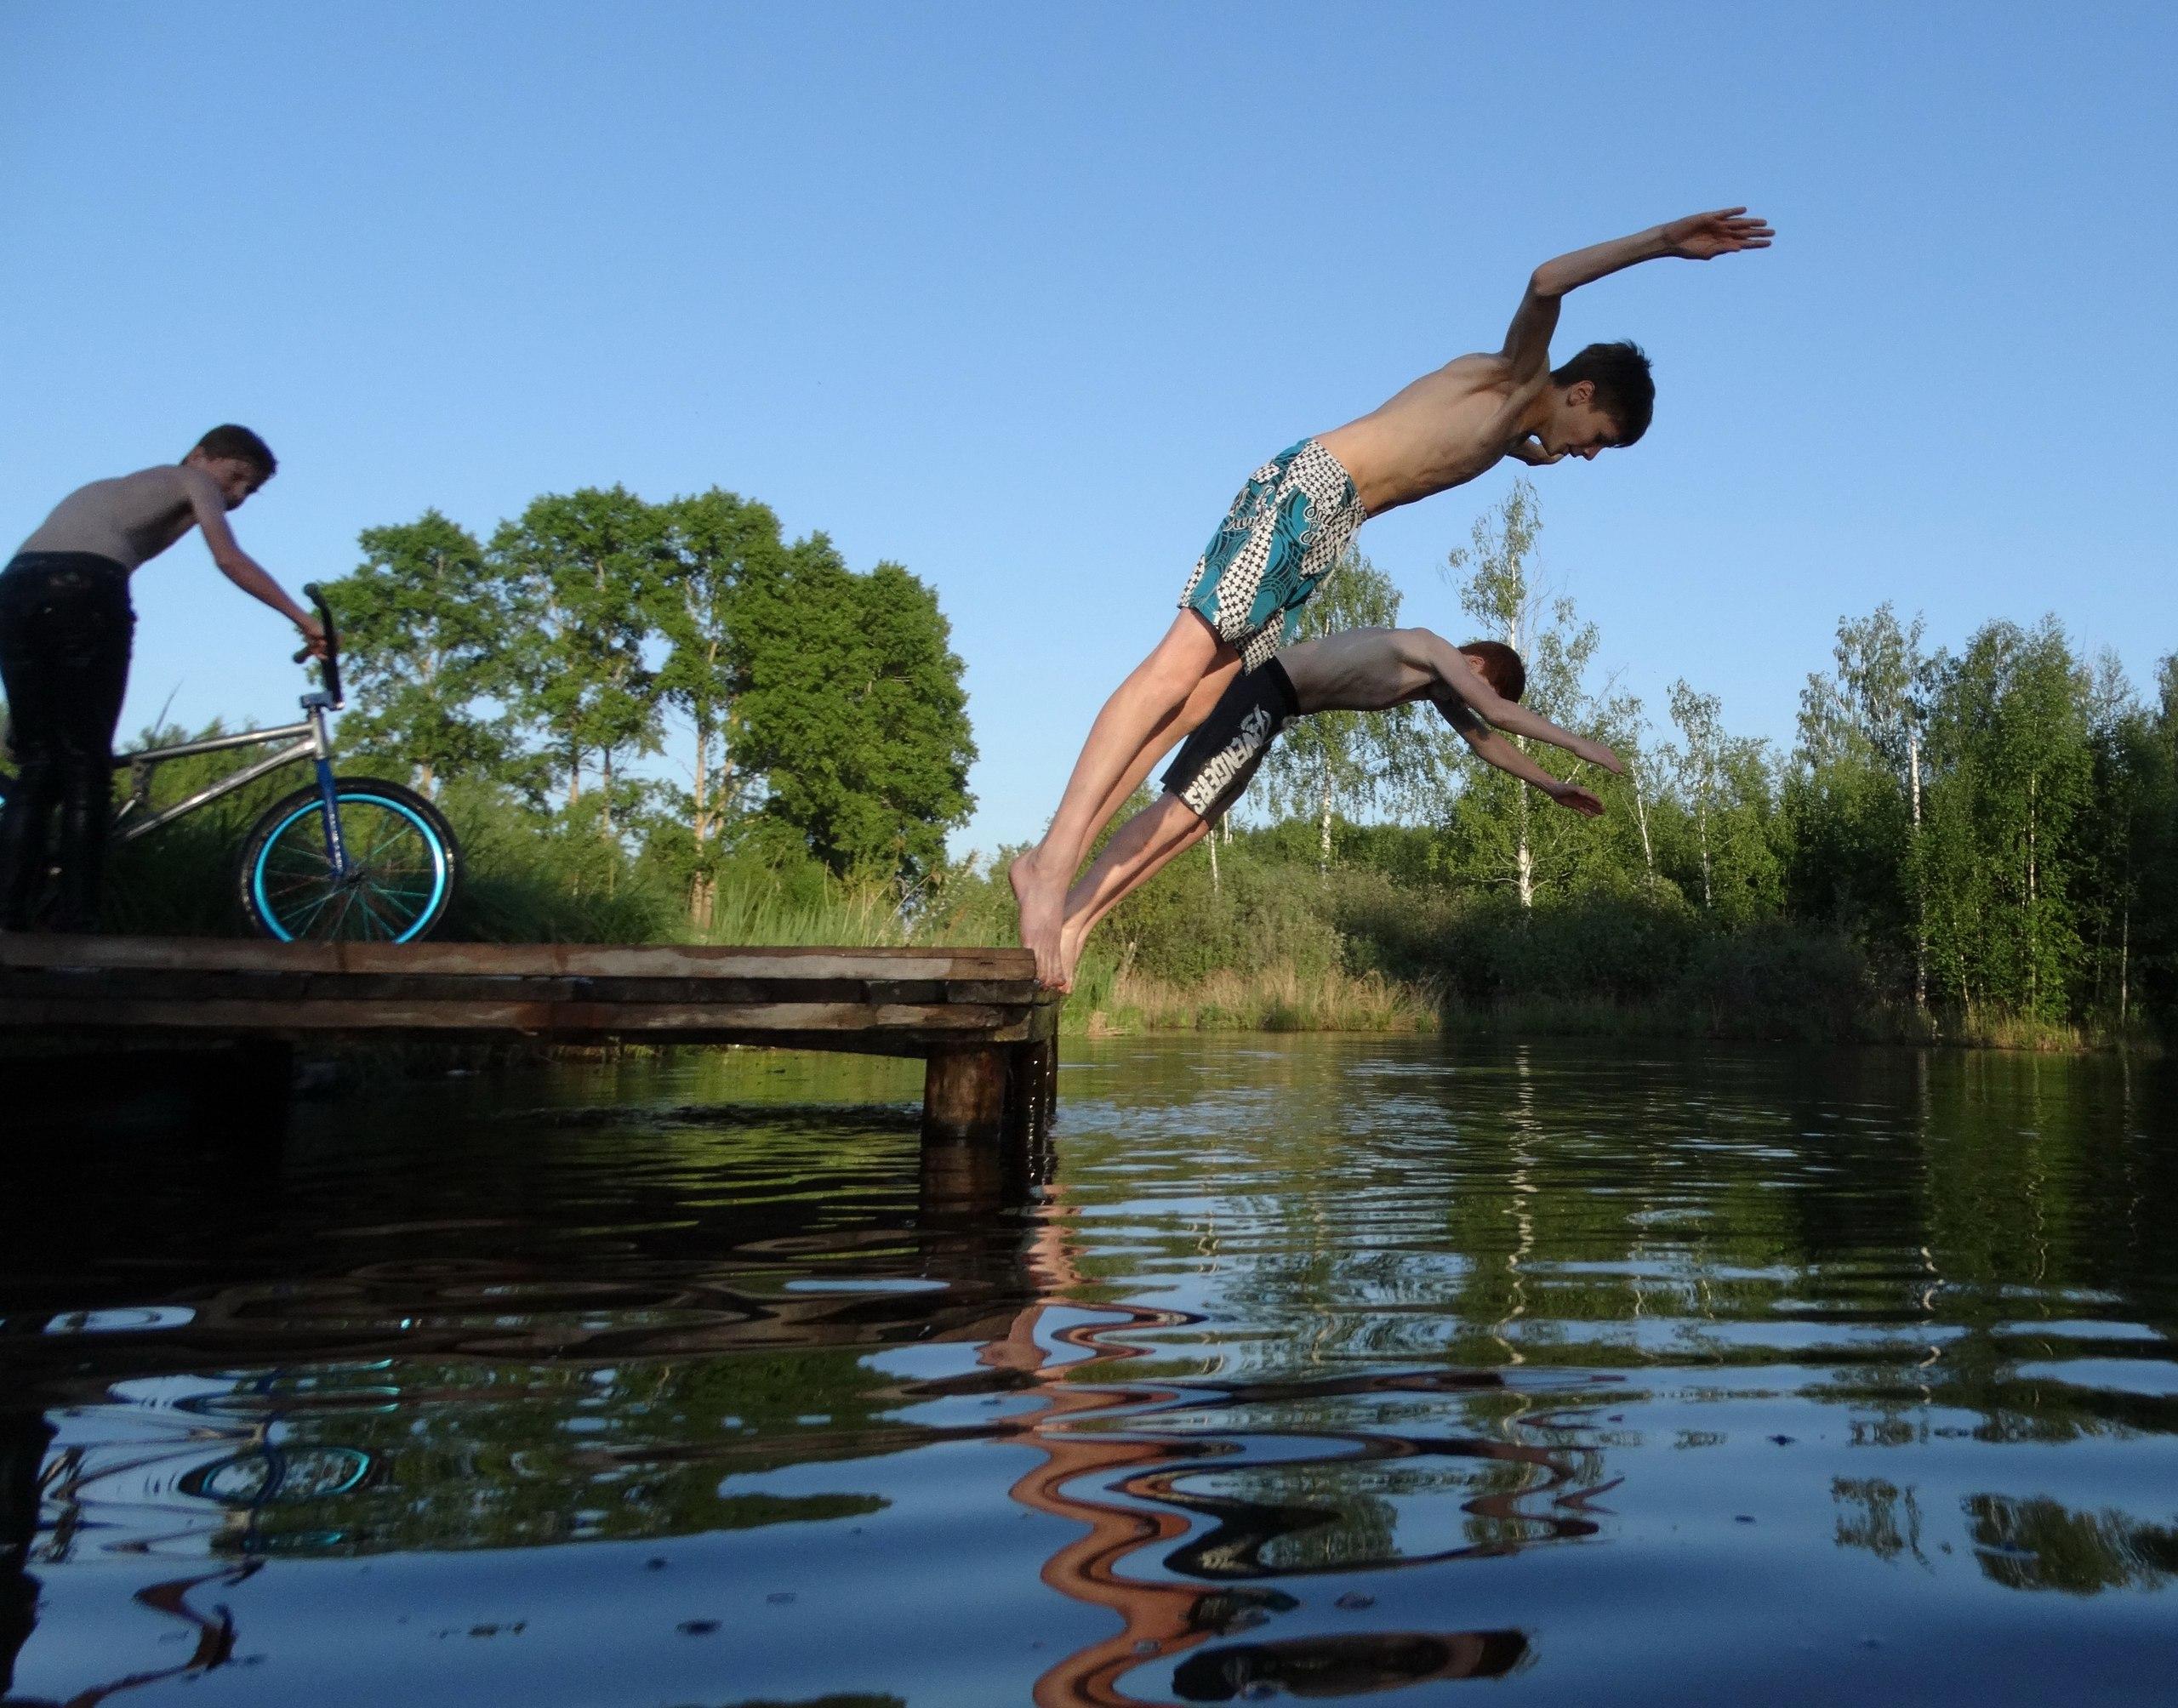 Александр Апатов: Купание на велосипедах